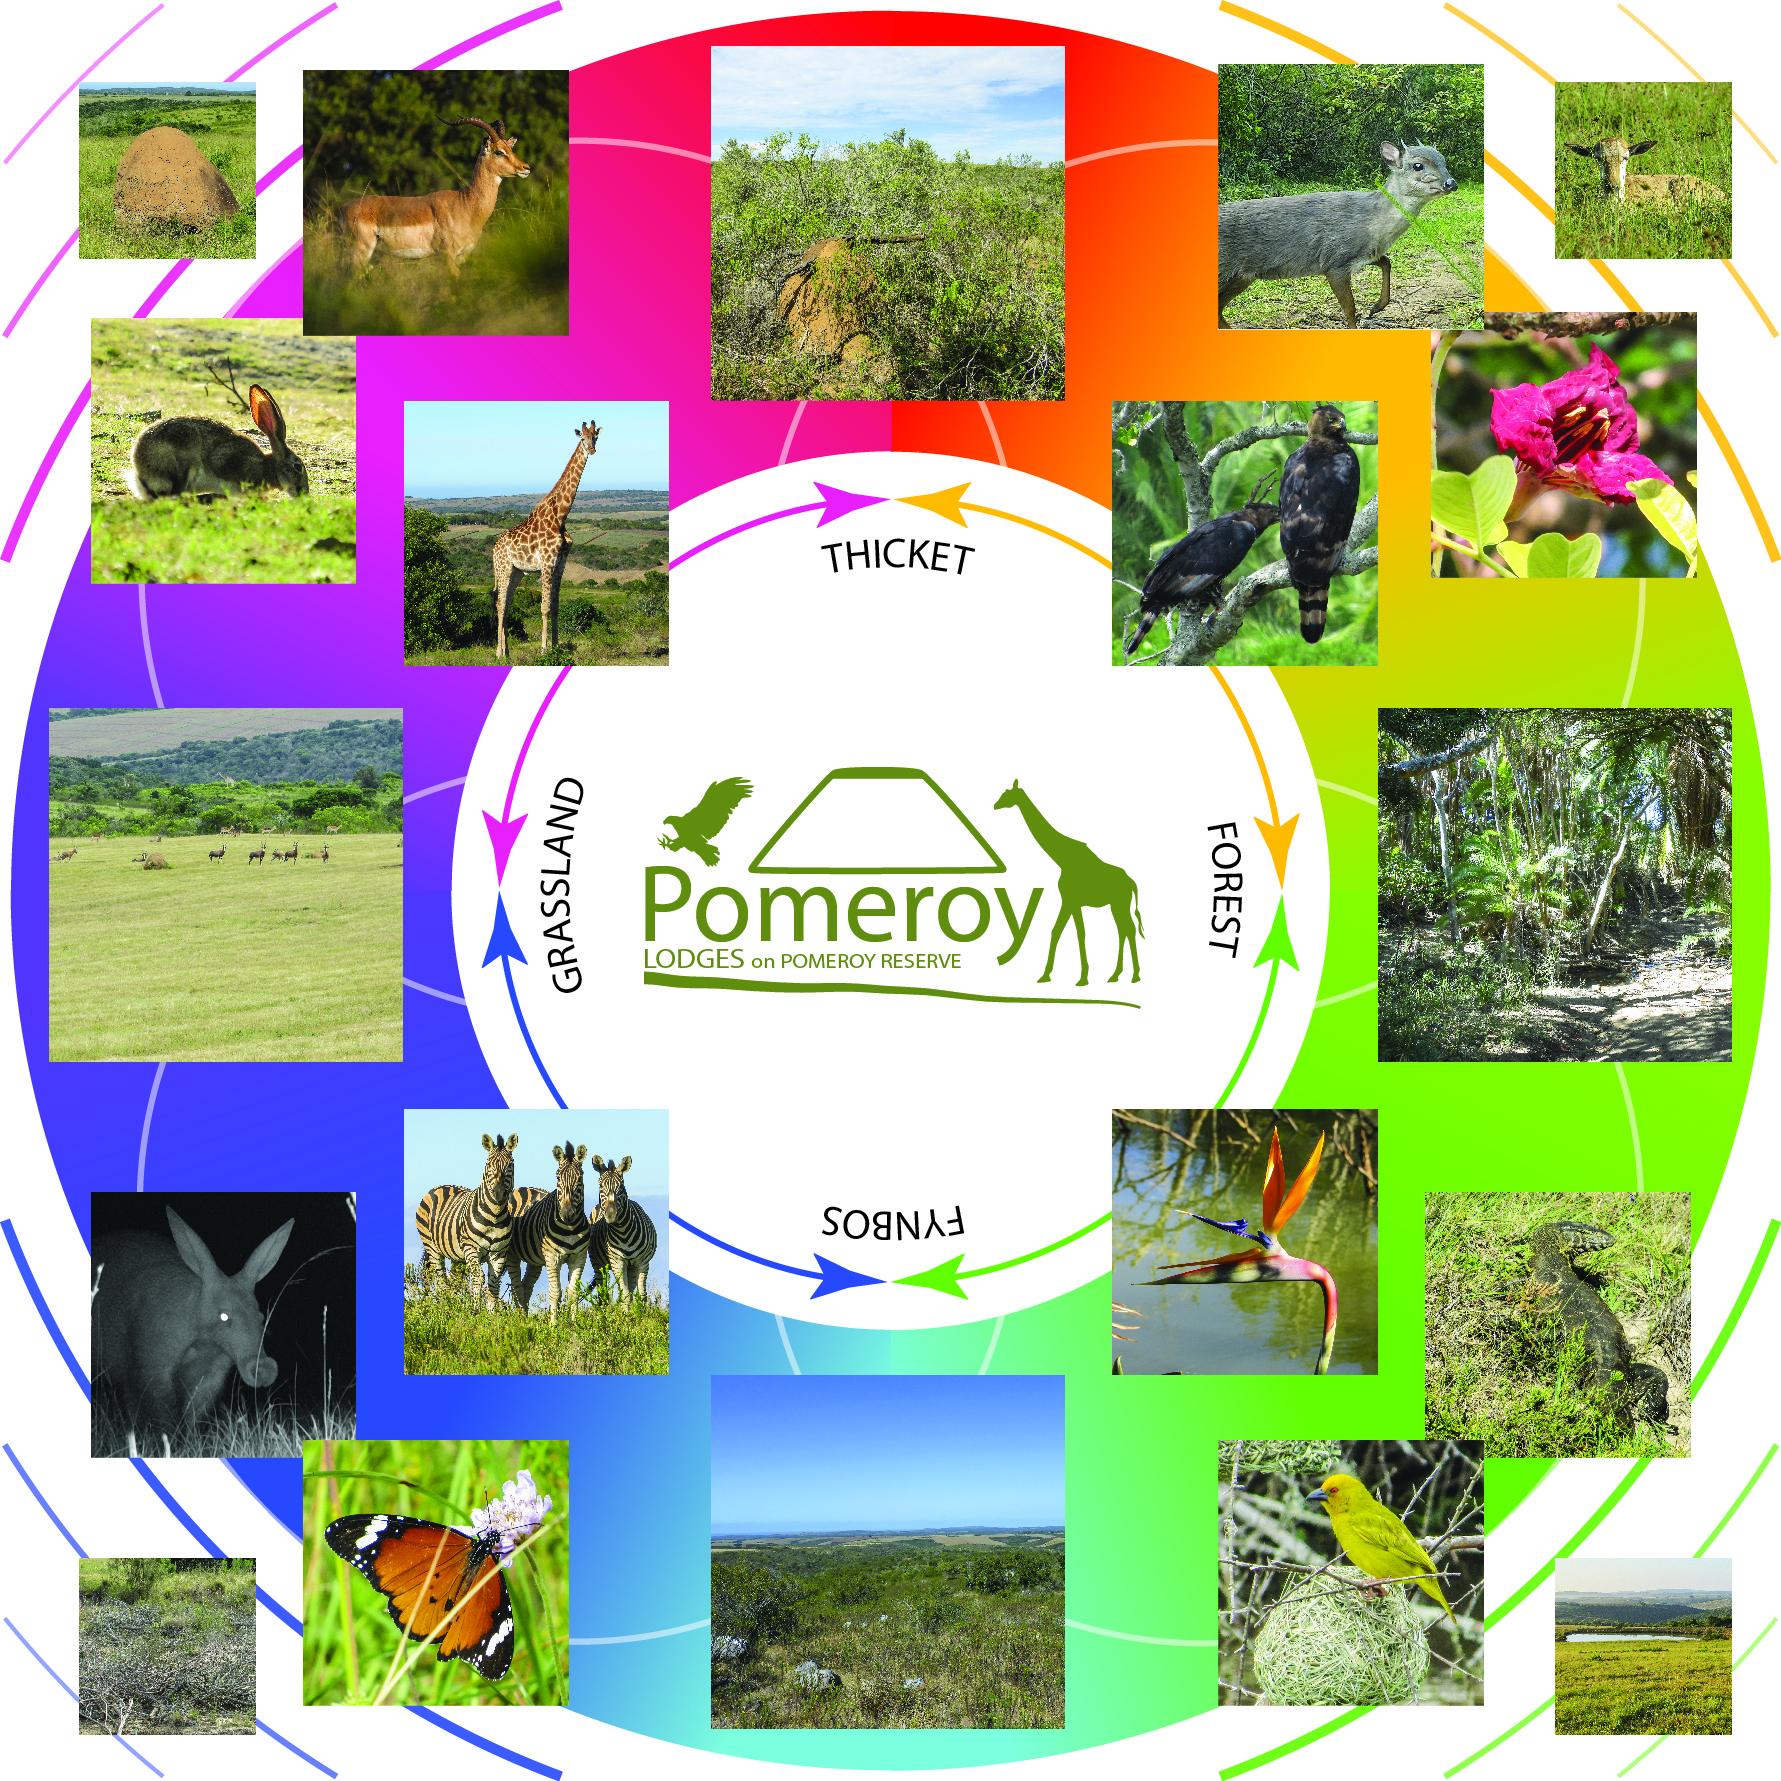 Pomeroy Reserve Bio-Diversity